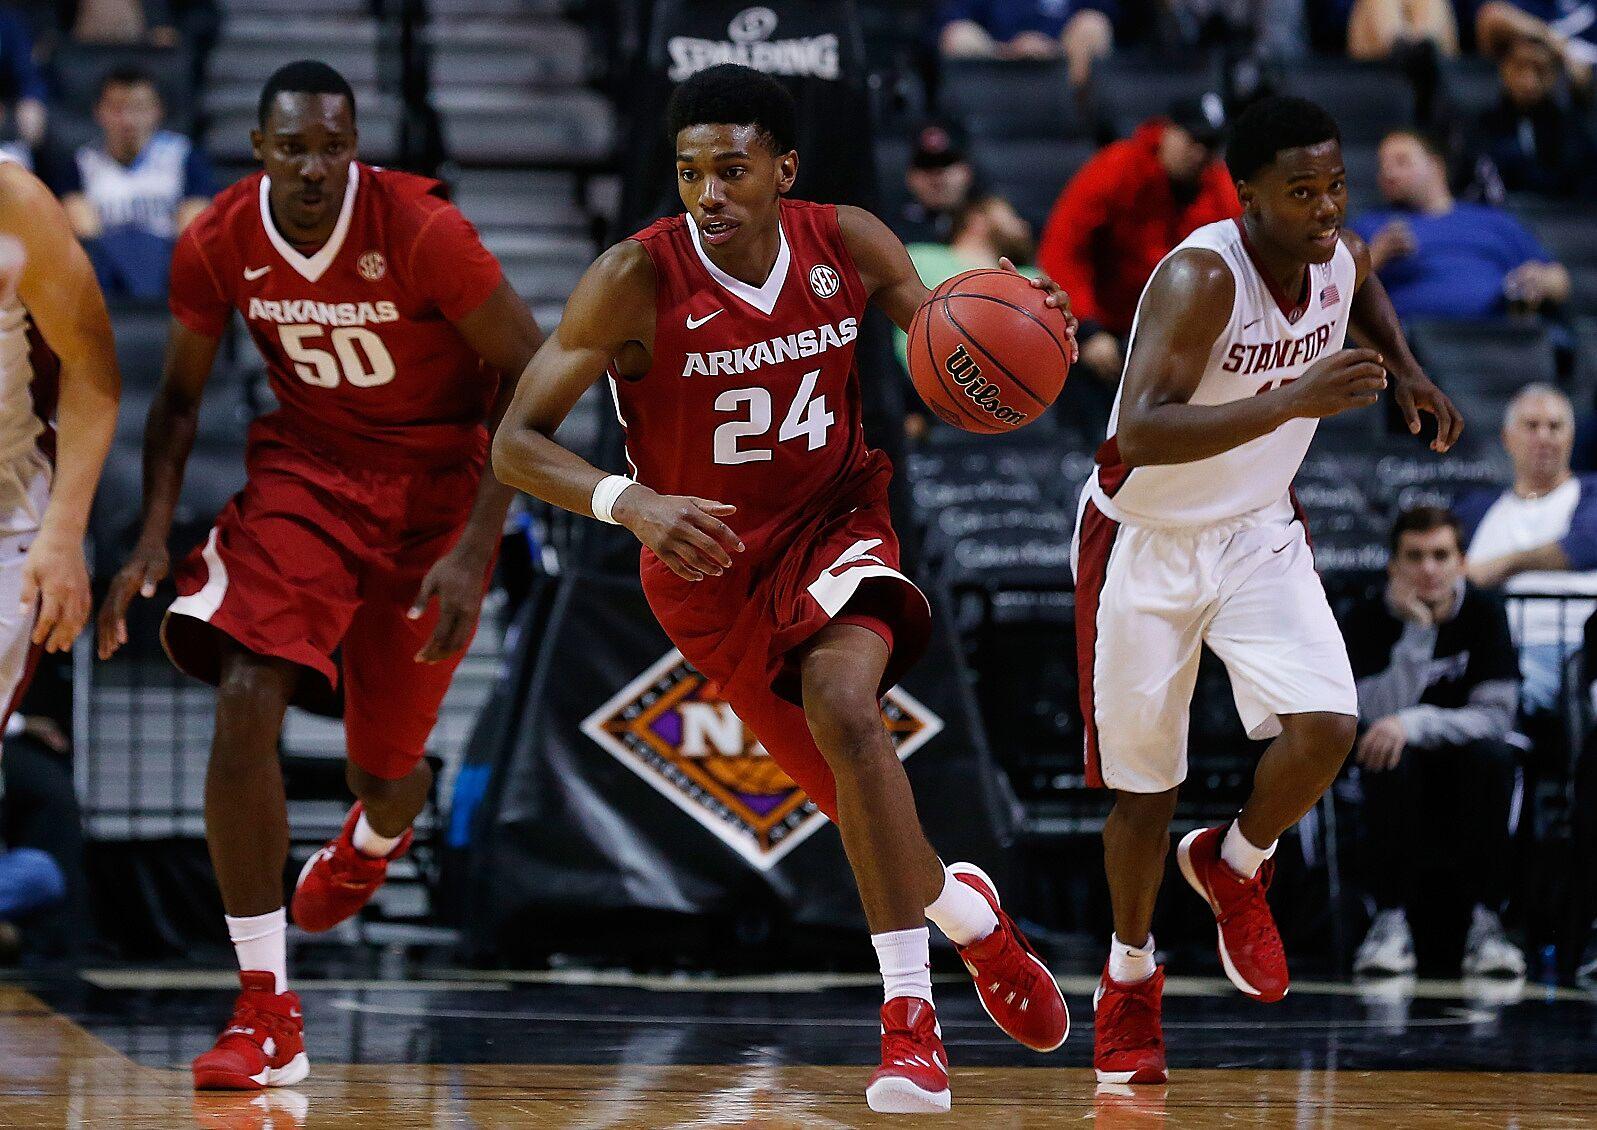 Arkansas Basketball: Preview of Razorbacks 2019-20 rotation